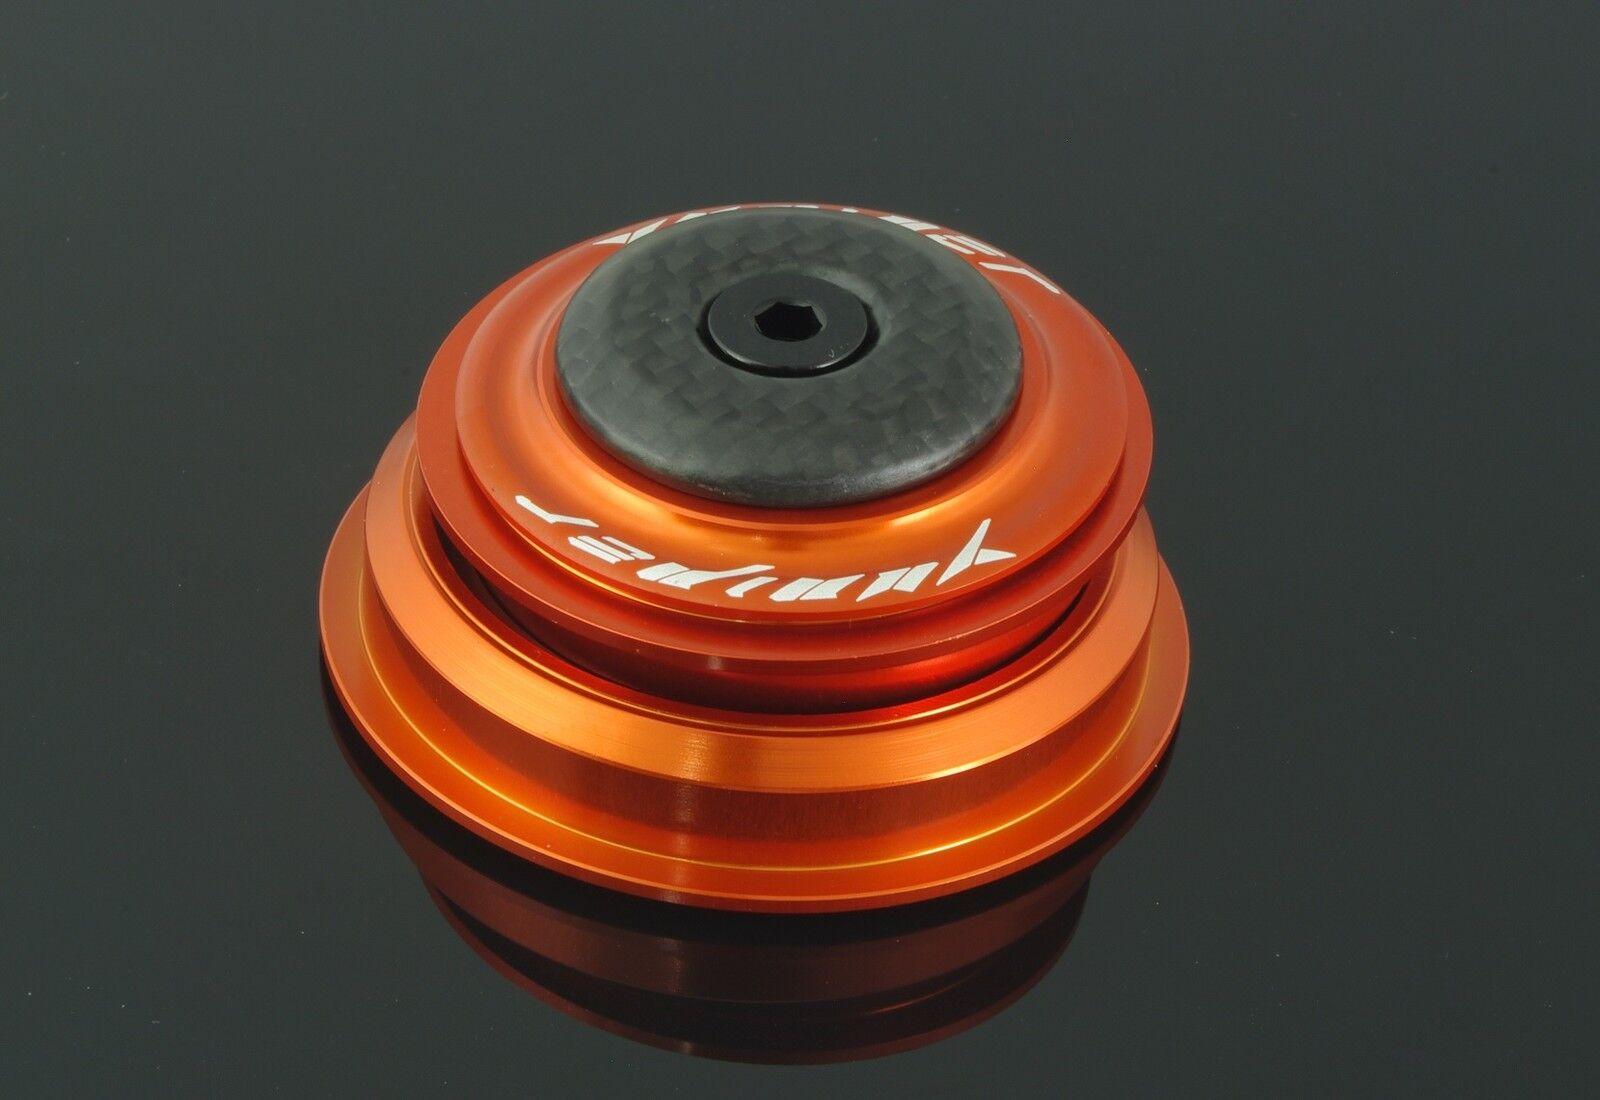 Yuniper TapeROT Steuersatz  87g 1 1/8 auf 1.5 Orange  56 mm  Carbon (tune it)